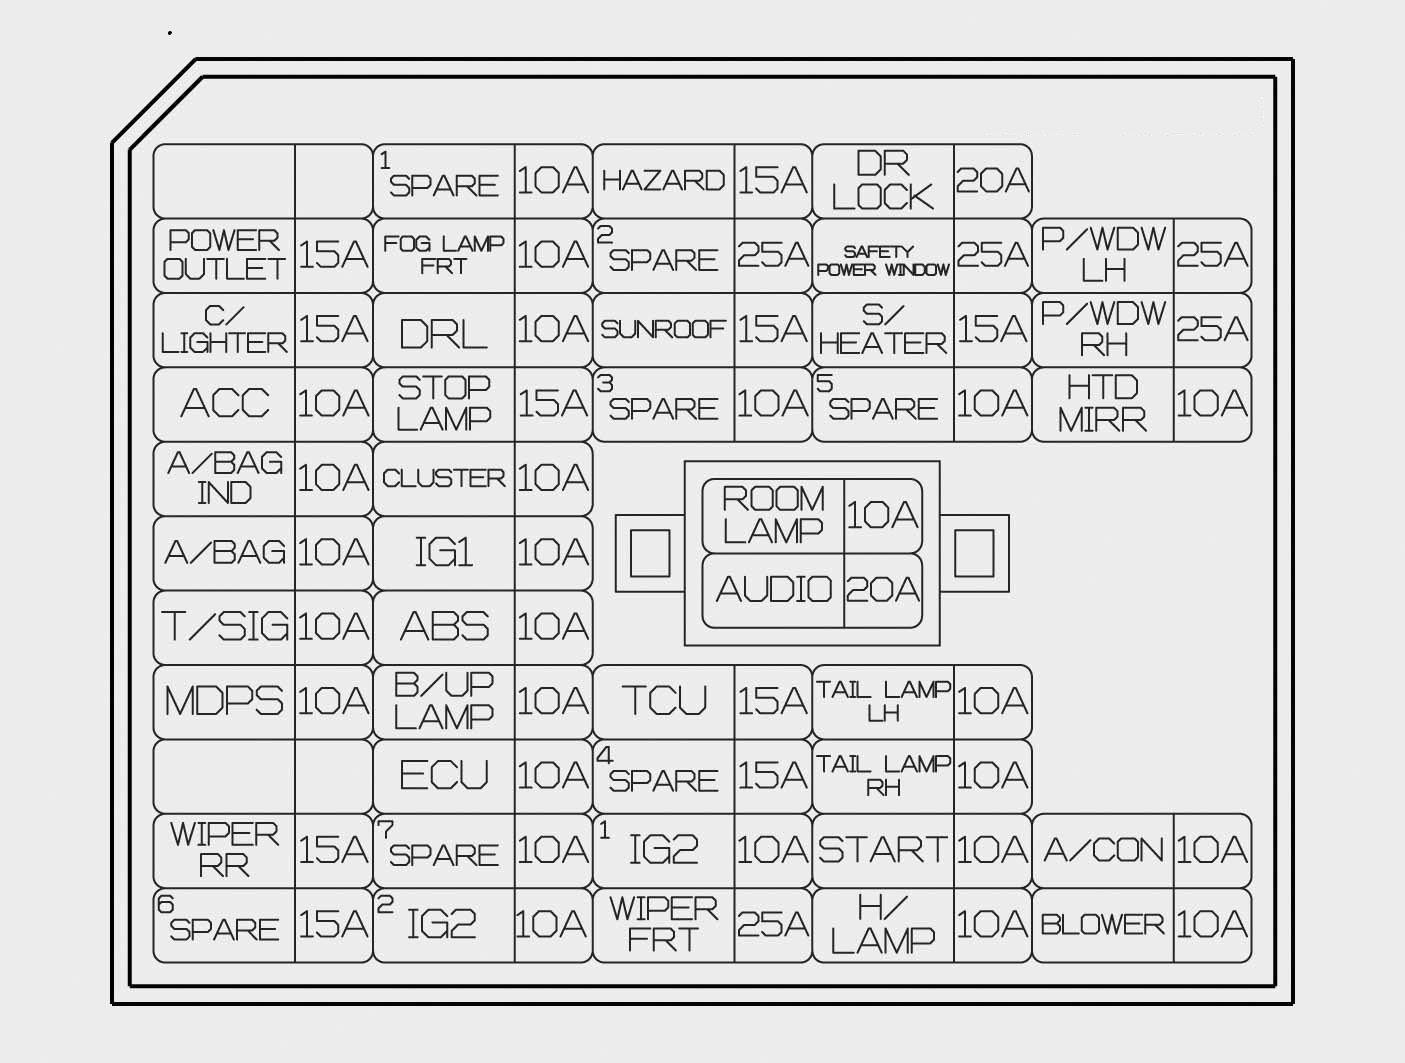 2013 Hyundai Sonata Fuse Diagram Wiring Diagrams Data Pack Pack Ungiaggioloincucina It